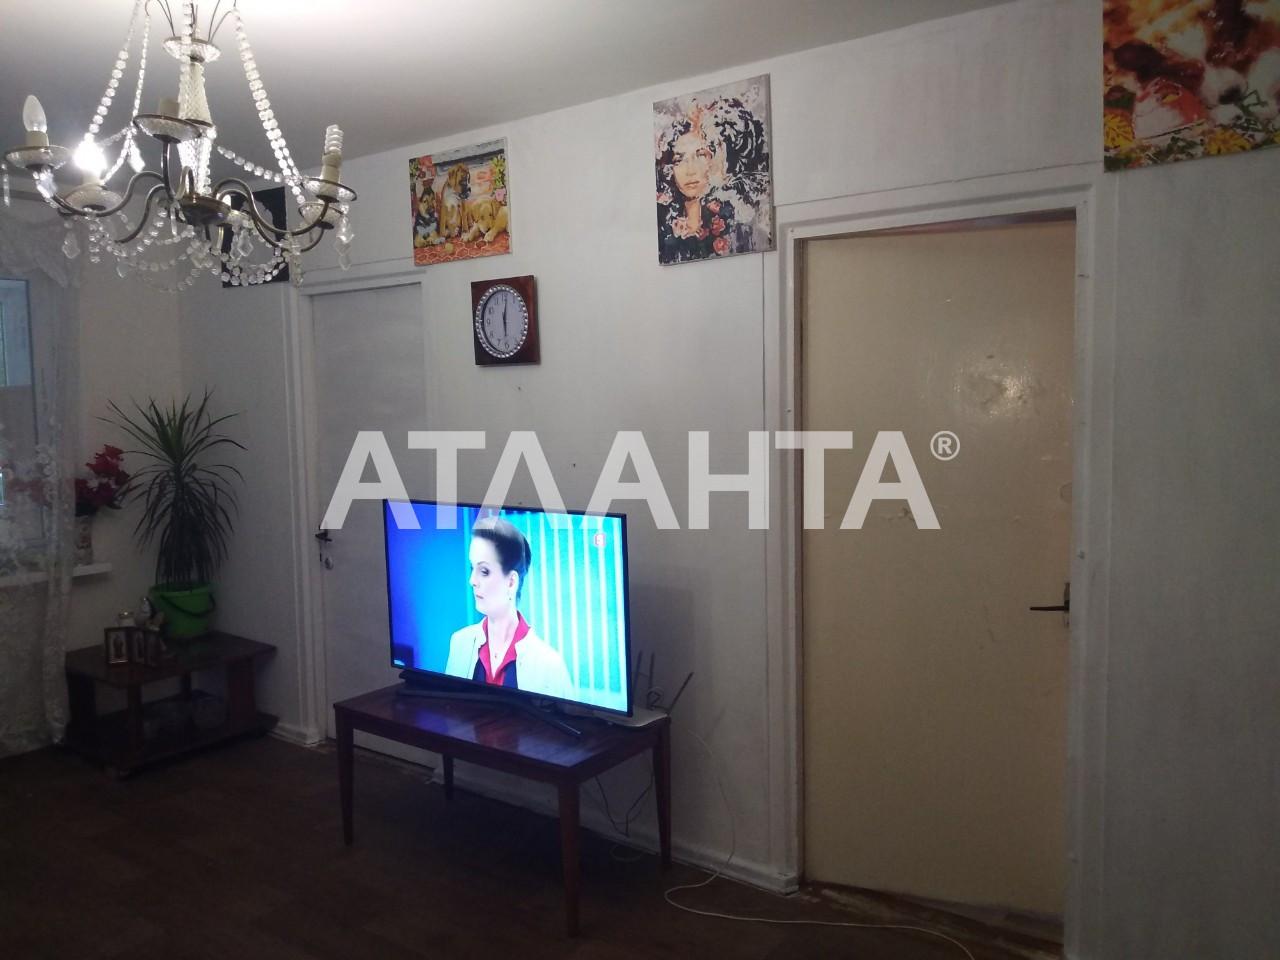 Продается 4-комнатная Квартира на ул. Малиновского Марш. — 43 000 у.е. (фото №12)